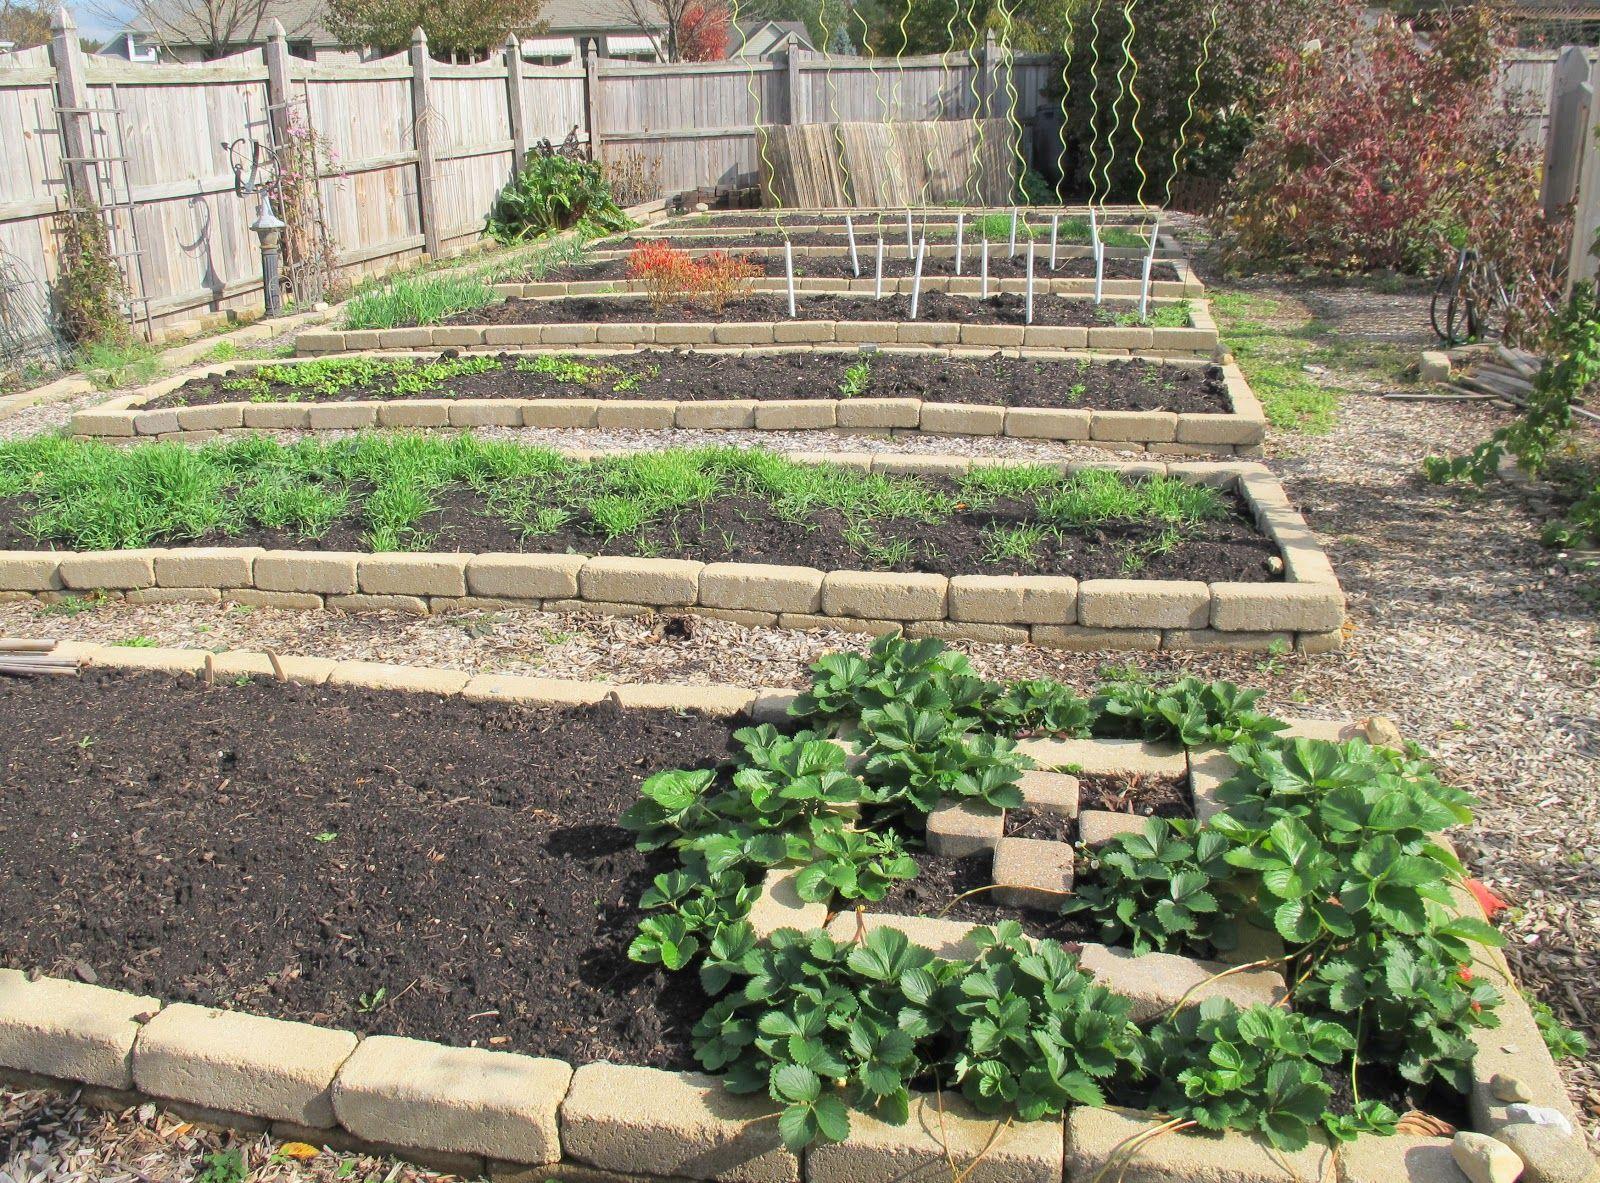 Vegetable garden layout | Home vegetable garden design ...